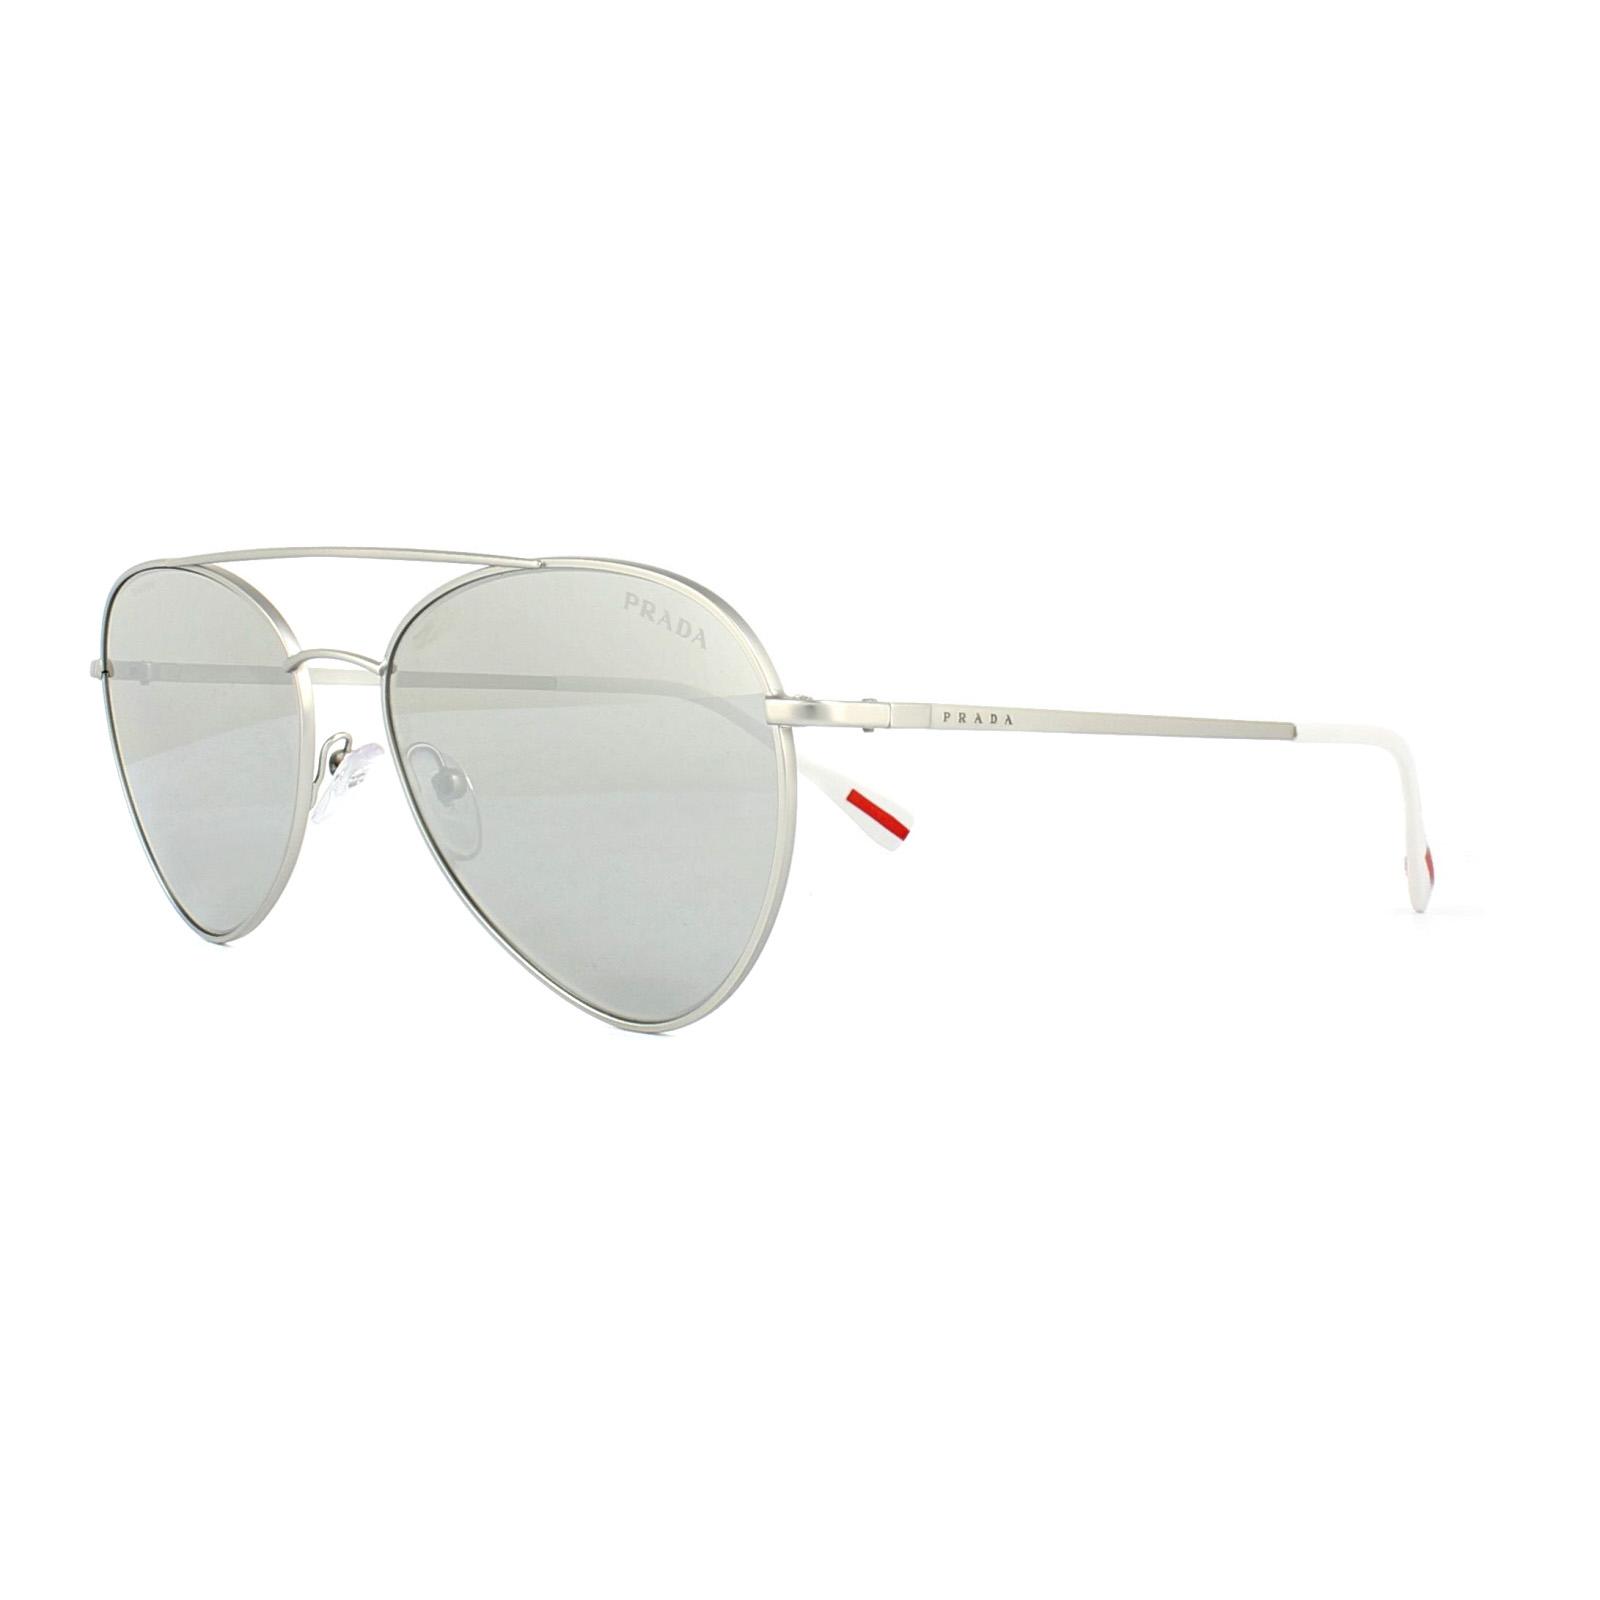 63e114dae6 Sentinel Prada Sport Sunglasses 50SS 1AP2B0 Matt Silver Grey Silver Mirror